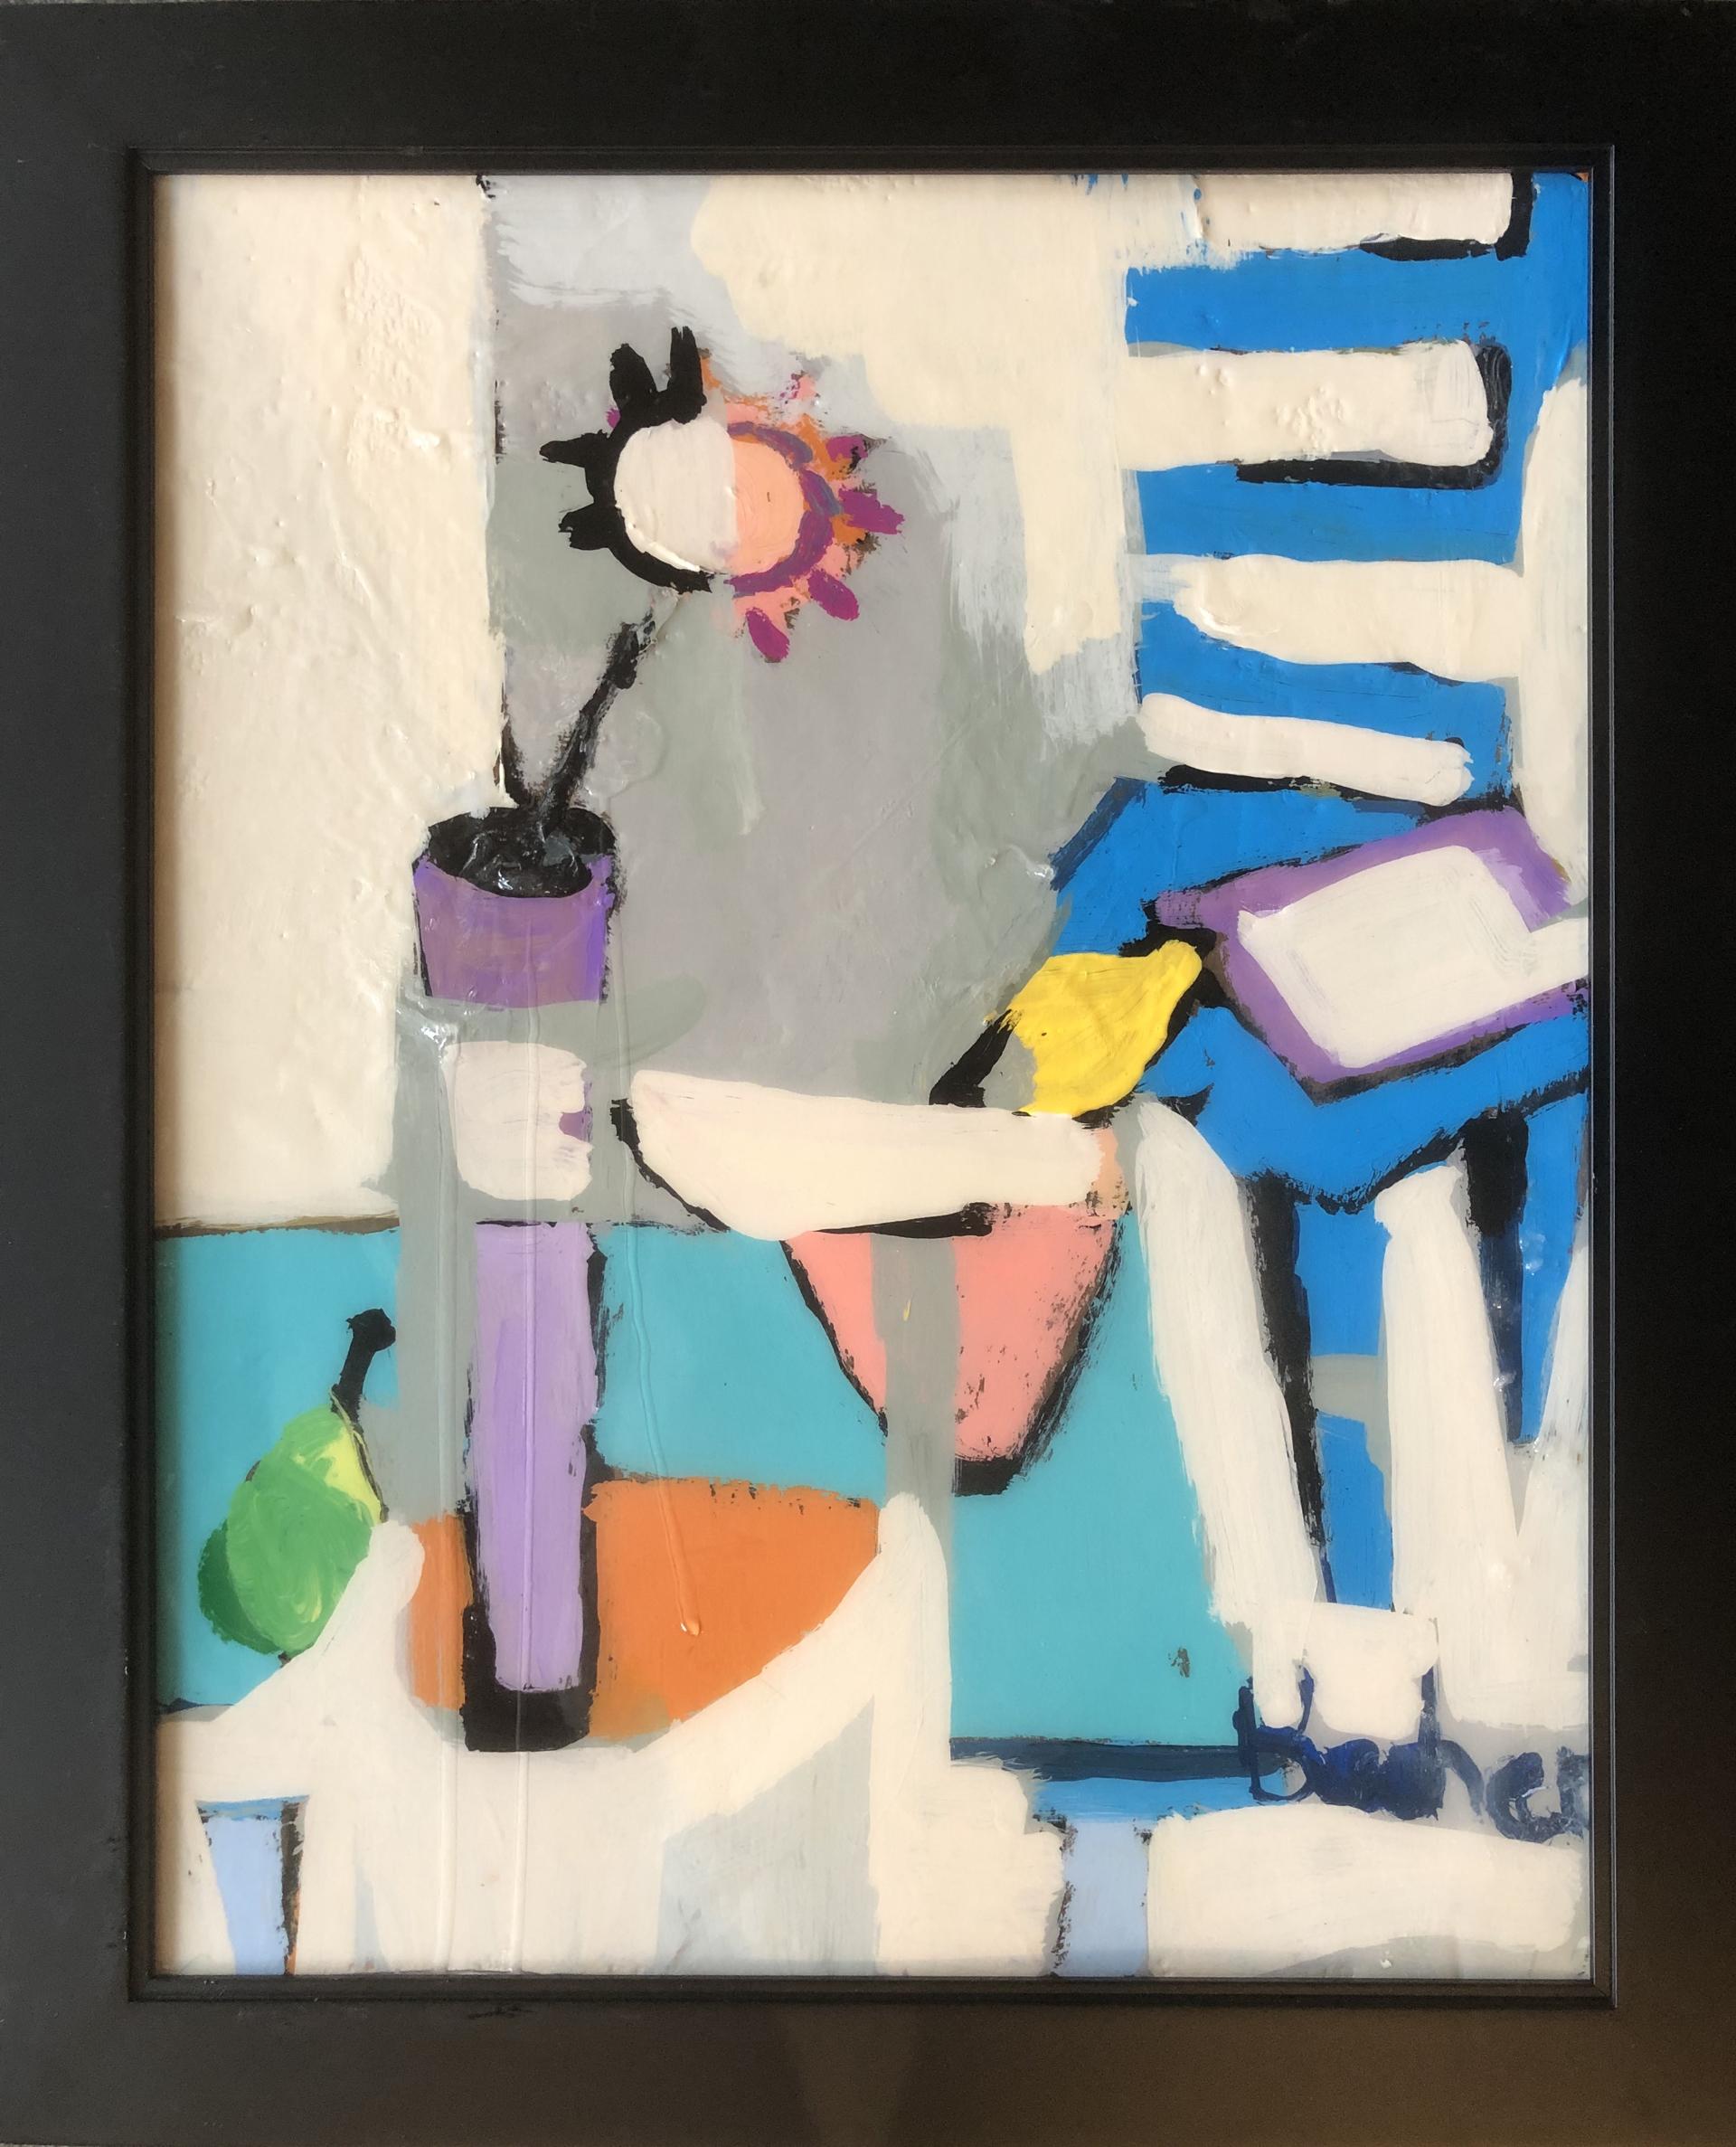 Tablescape II by Gary Bodner